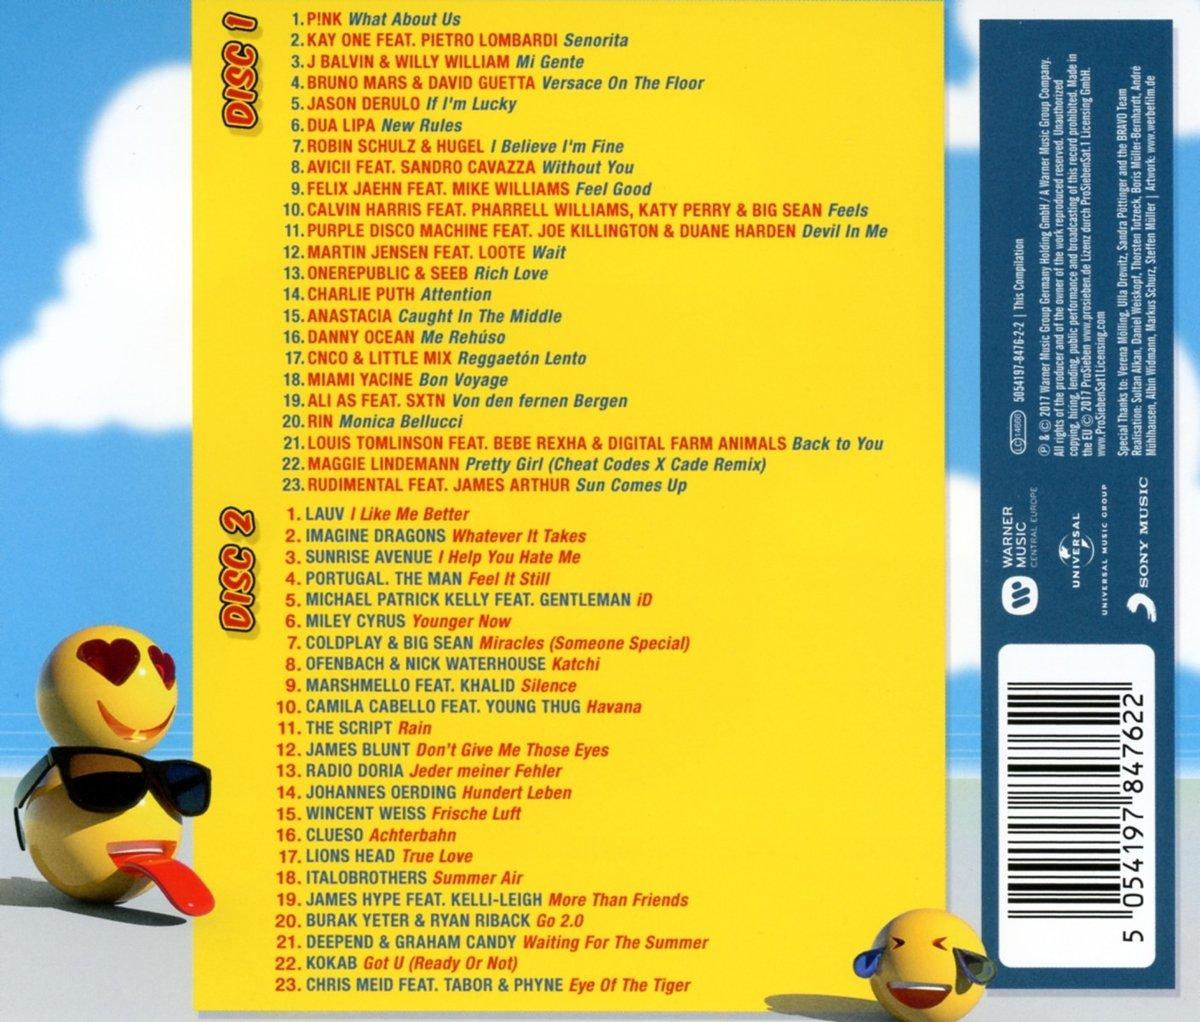 bravo hits vol 99 tracklist  bravo hits 99 2017 tracklist  bravo hits 99 erscheinungsdatum  bravo hits 99 tracklist  bravo hits 99 download  bravo hits 99 reinhören  bravo hits 99 anhören  bravo hits 99 hörprobe